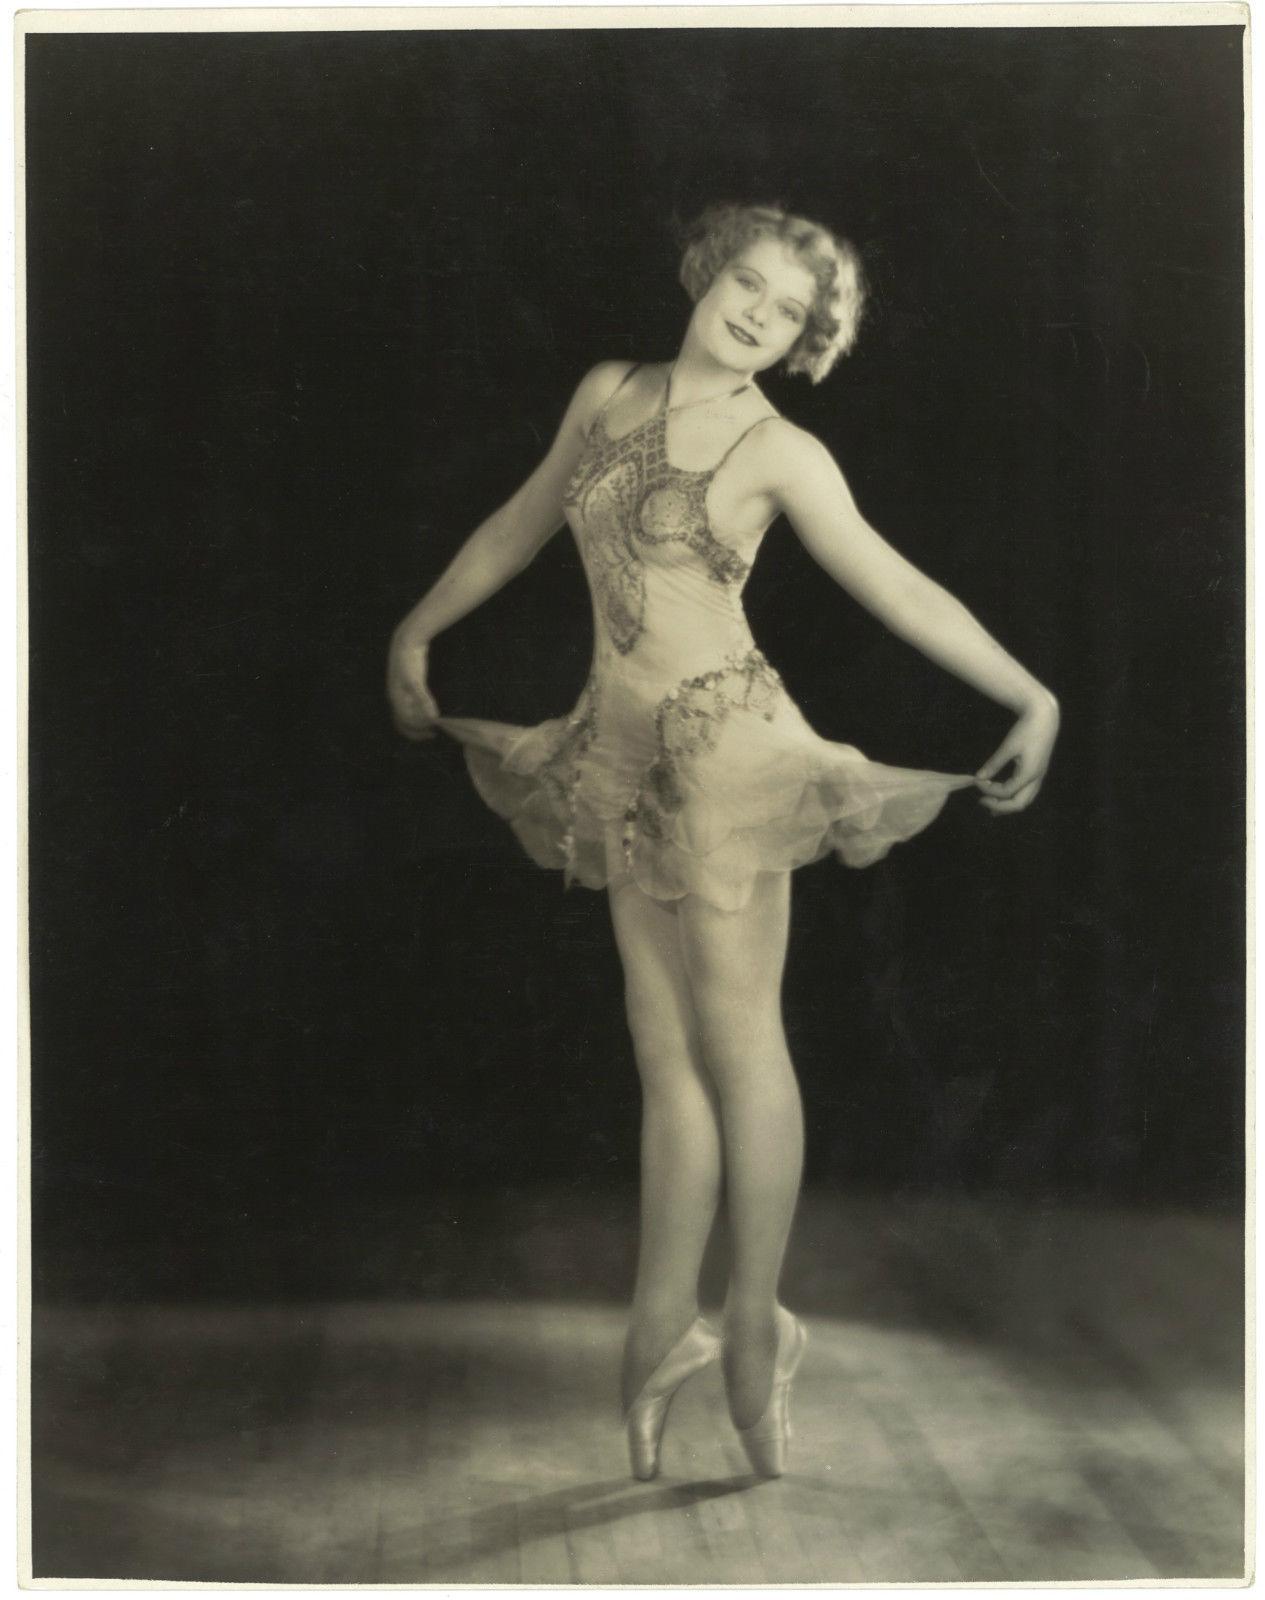 Edward Bower Hesser -The acrobatic dancer,Muriel Garnier,1920-1925